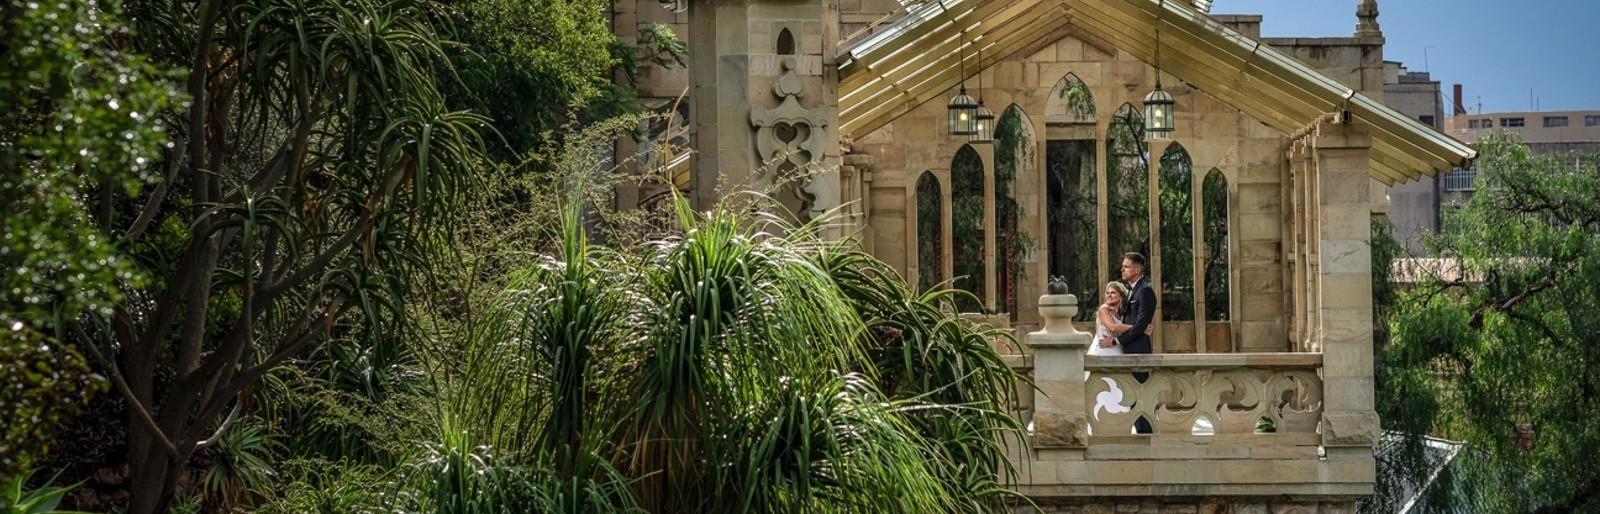 Shepstone Gardens Black Friday Special